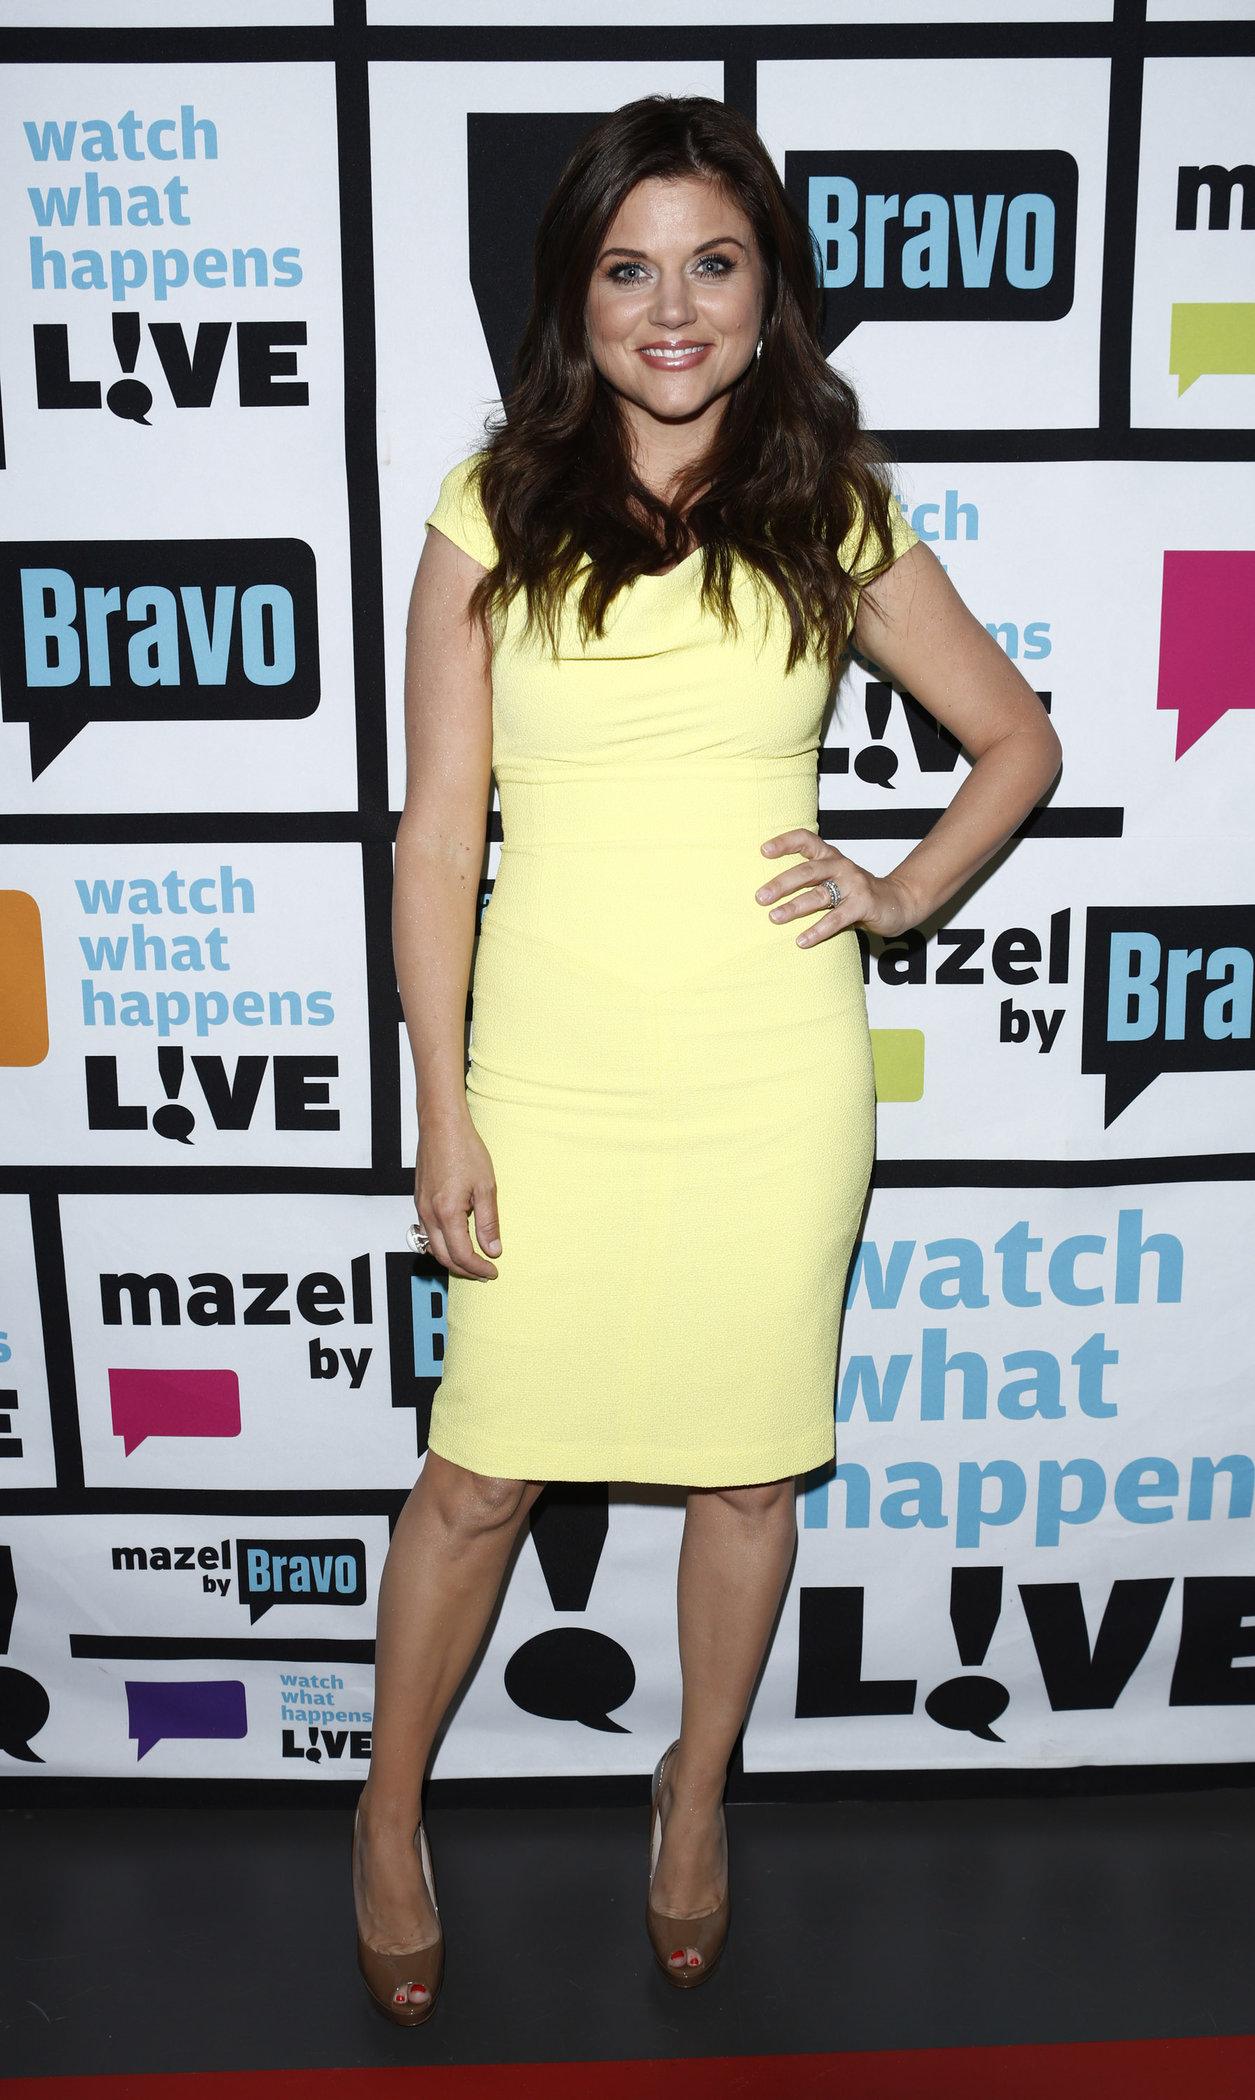 Tiffani Amber Thiessen - Watch What Happens Live Season 7 - Episode 718 (July 17, 2012)